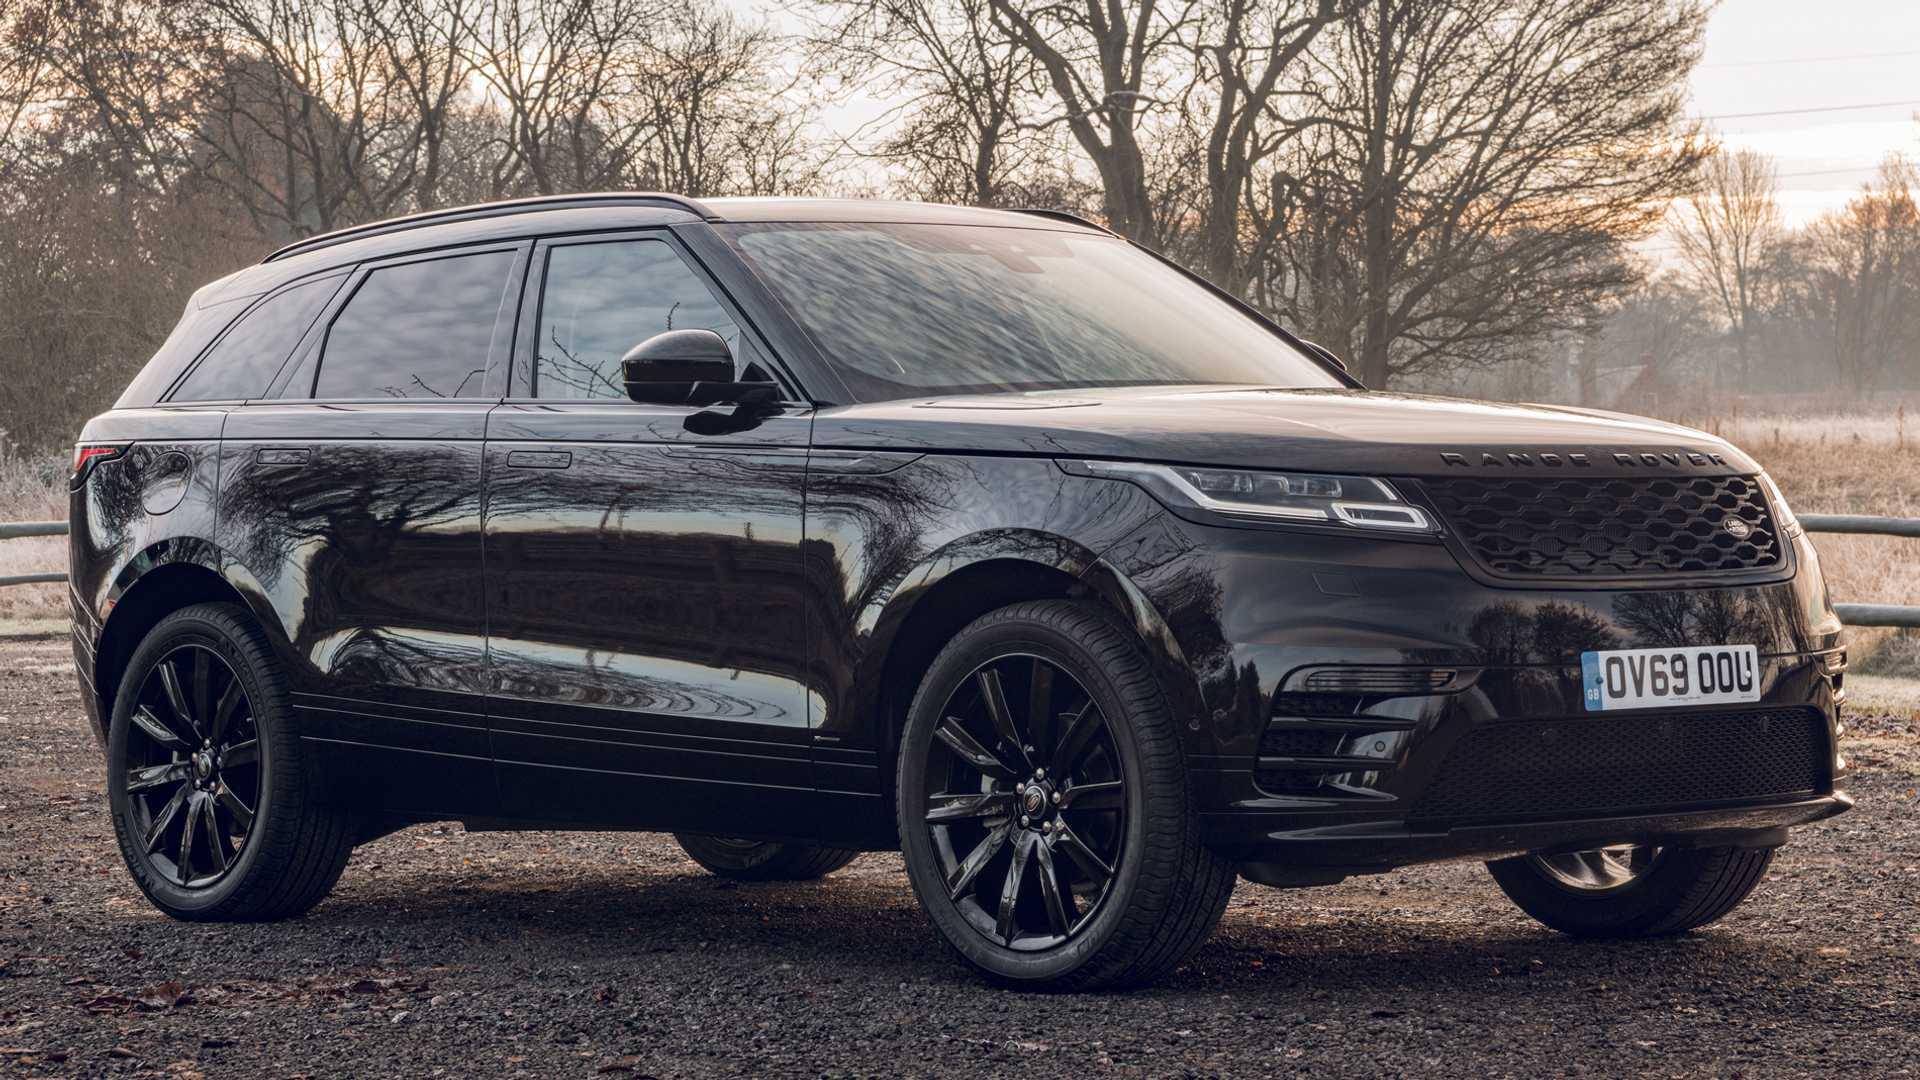 Range Rover adds limited Velar R-Dynamic Black edition for UK